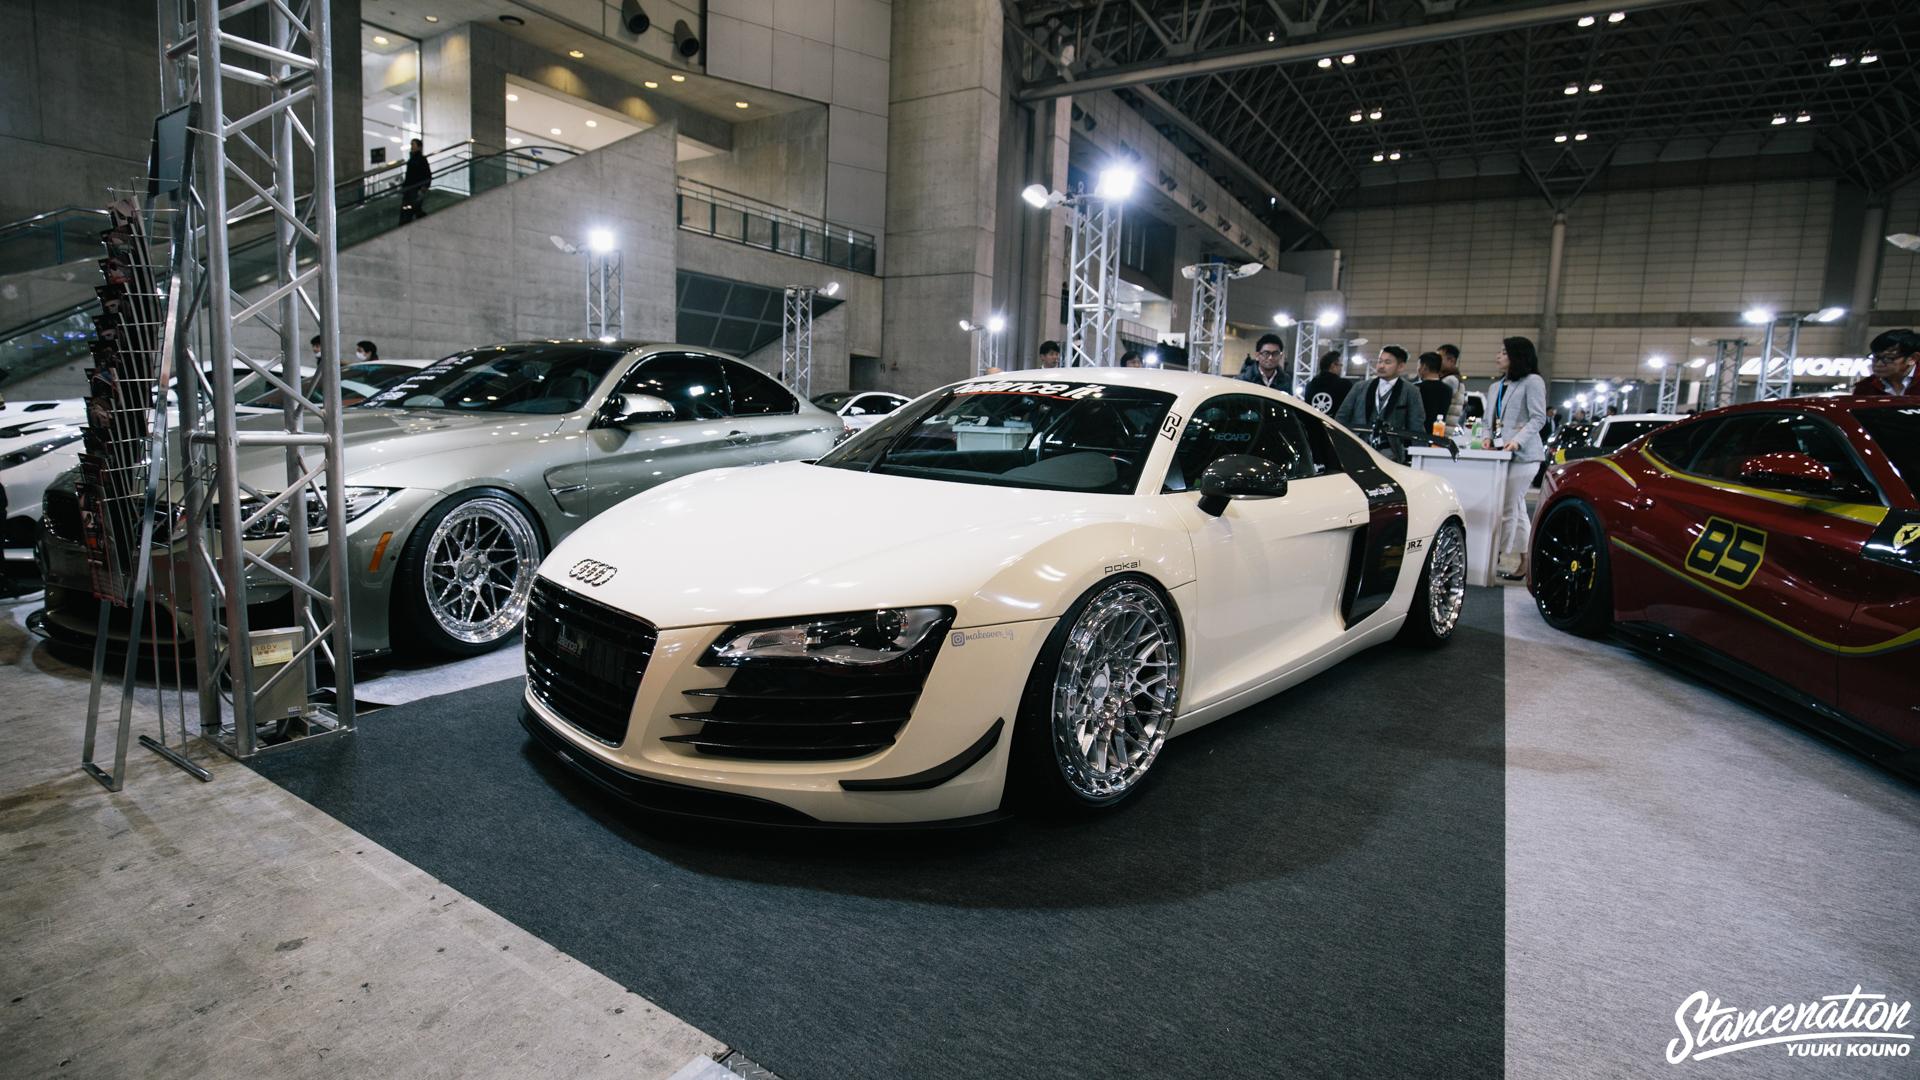 Tokyo auto salon 2017 photo coverage part 1 anything for 2006 tokyo auto salon